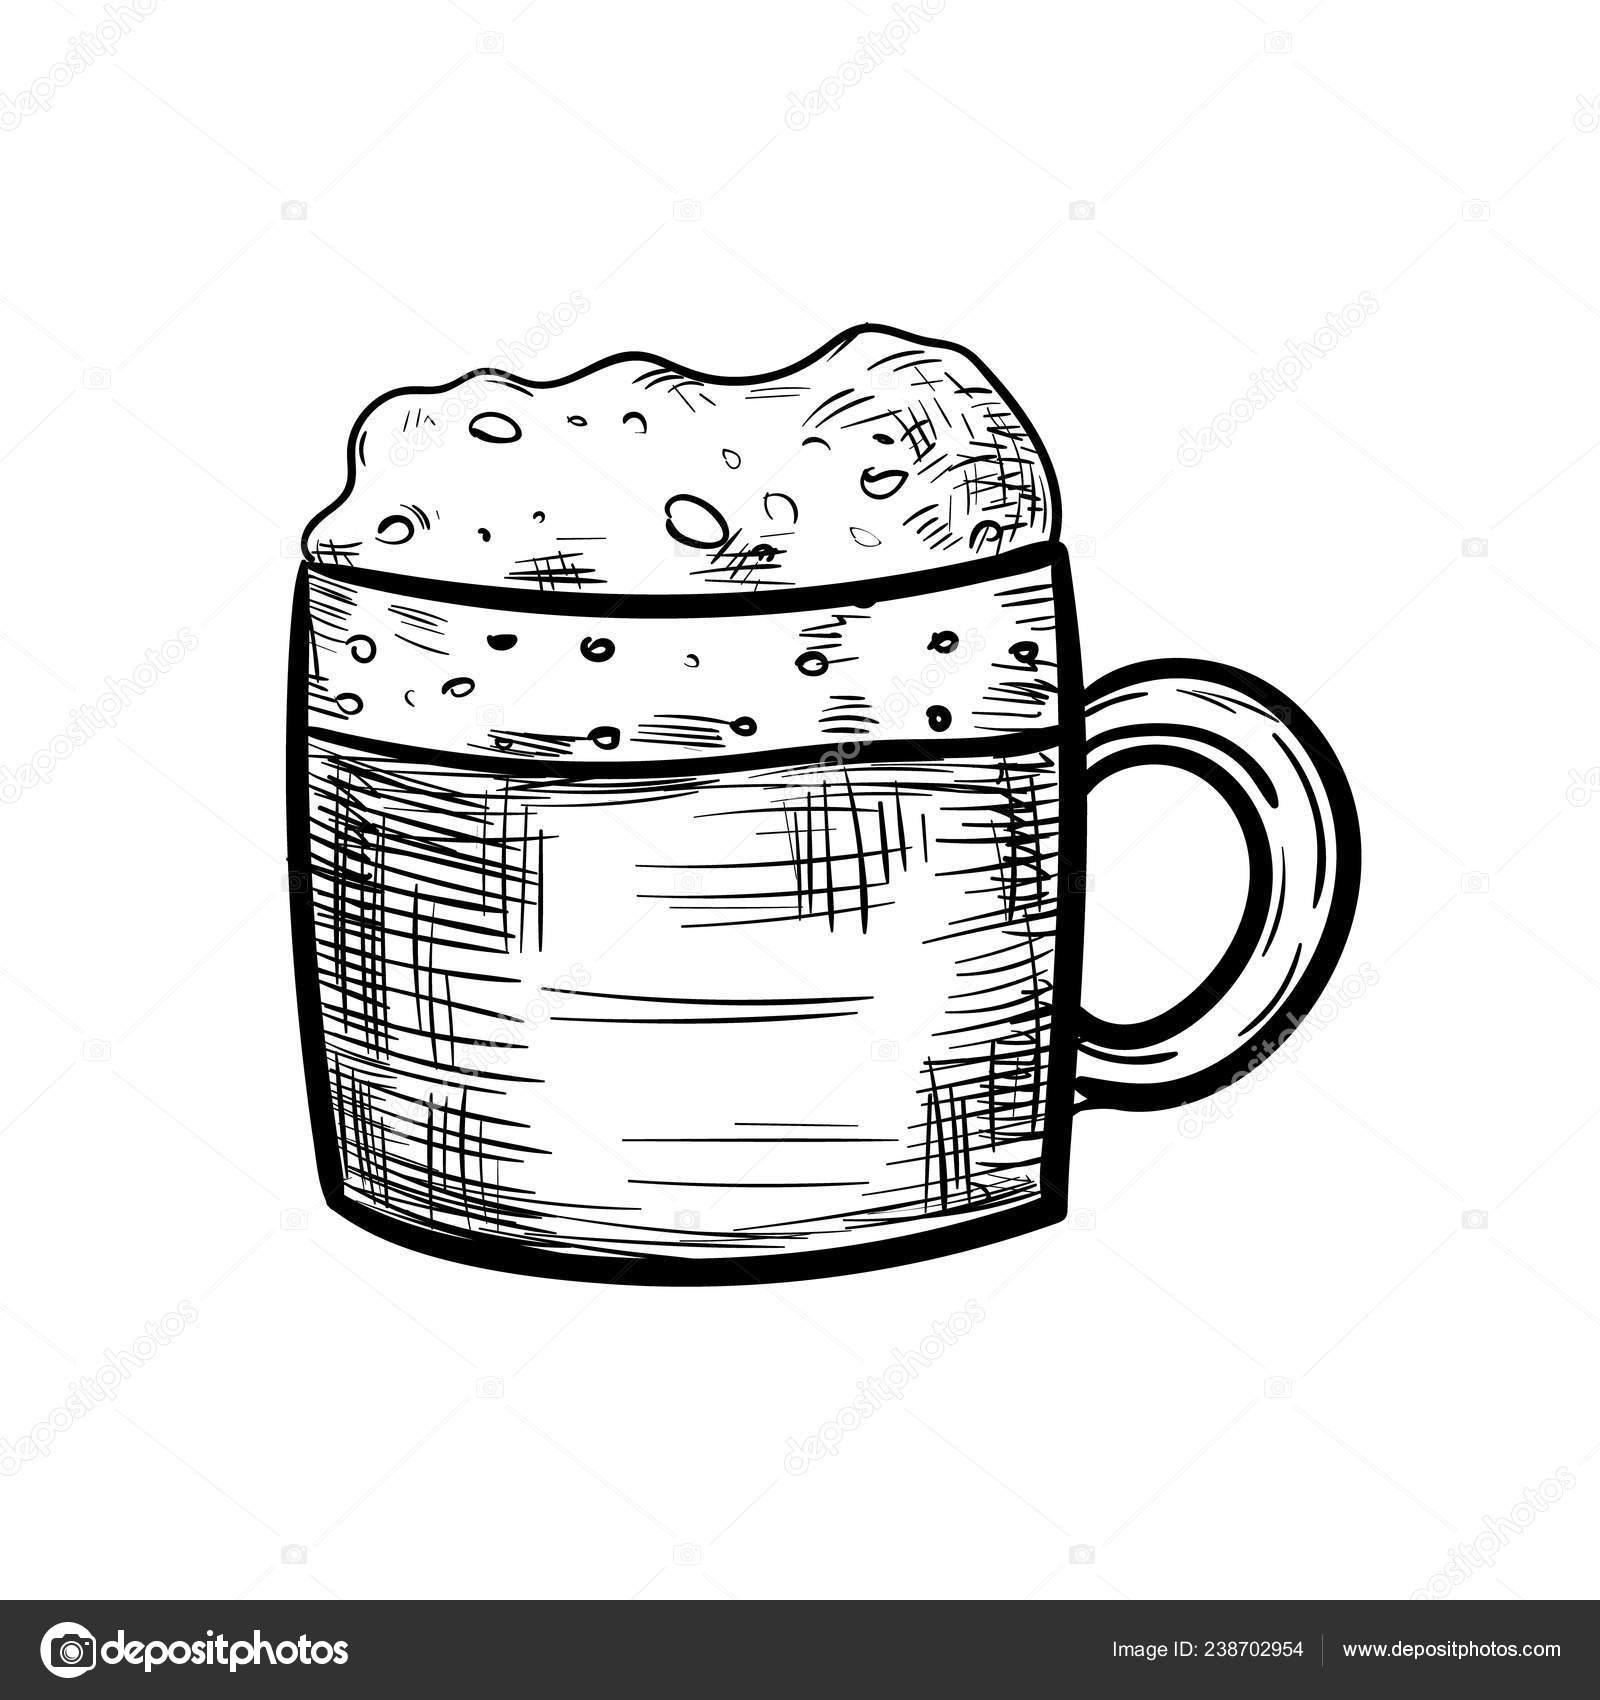 Icon Mug Hand Drawn Beautiful Hand Drawn Fashion Beer Mug Icon Hand Drawn Black Stock Vector C Frozenbunn 238702954